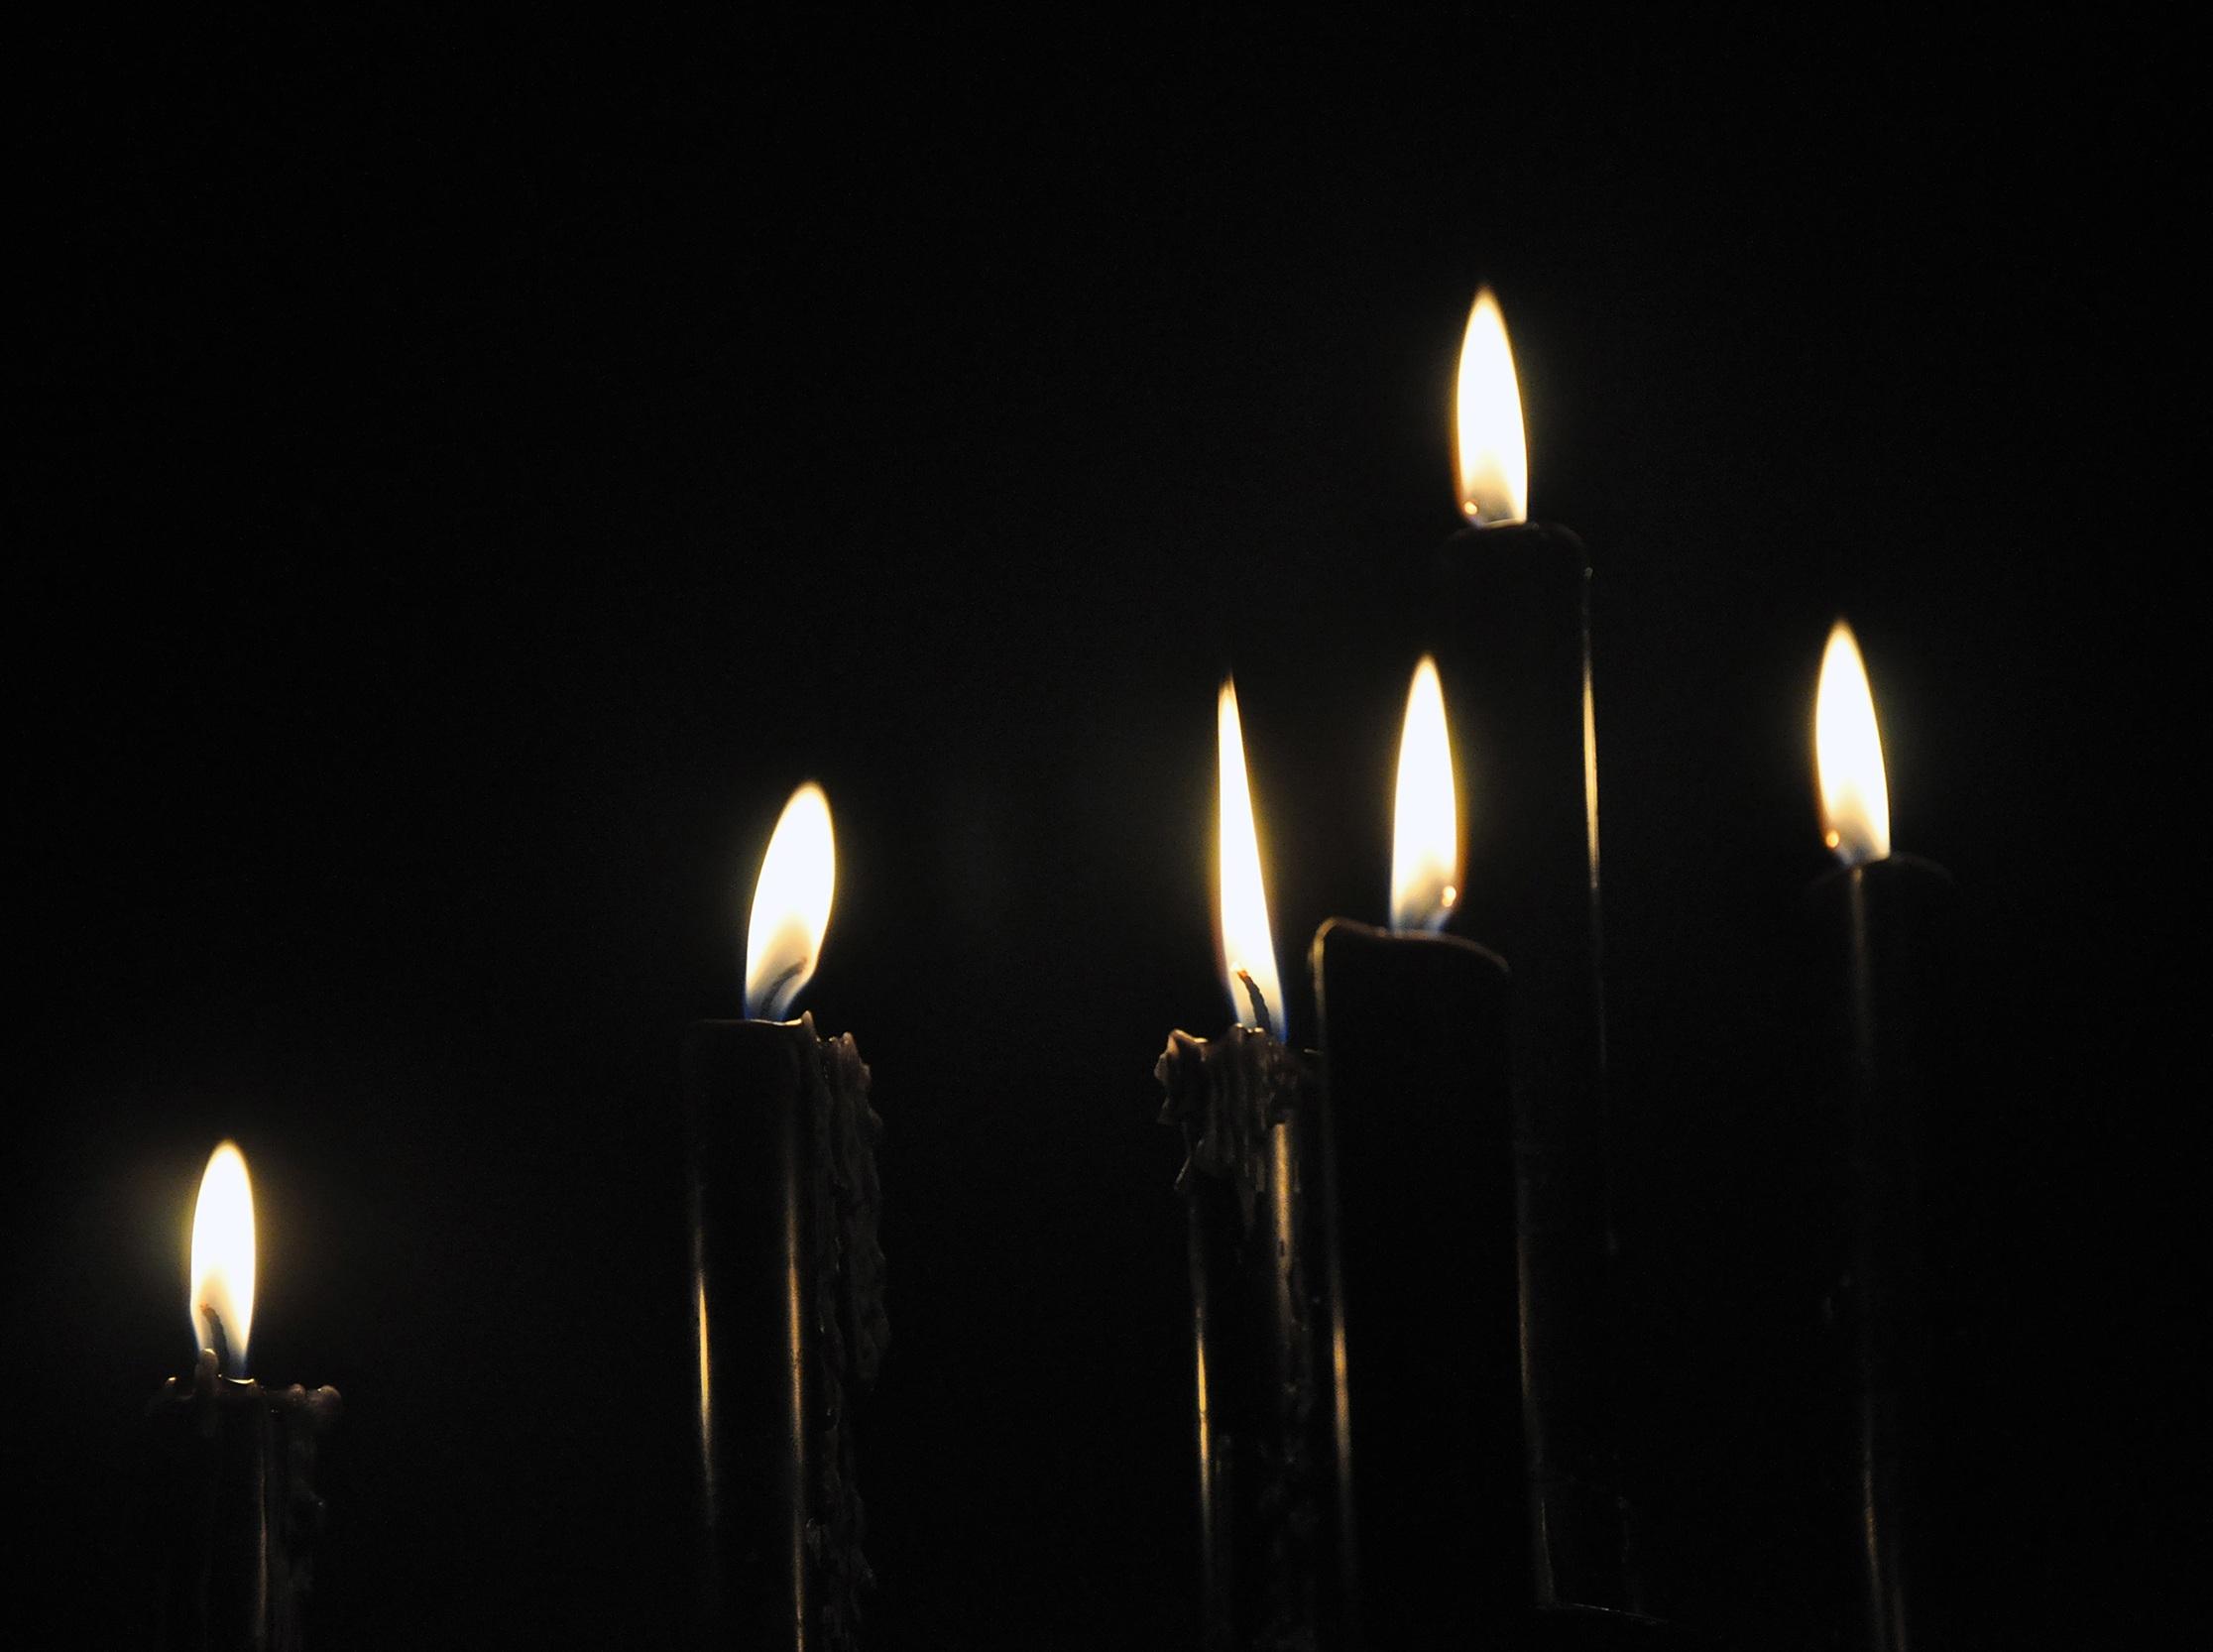 Light Glowing Night Dark Celebration Decoration Flame Fire Romantic Darkness Street Candle Lighting Decor Ornament